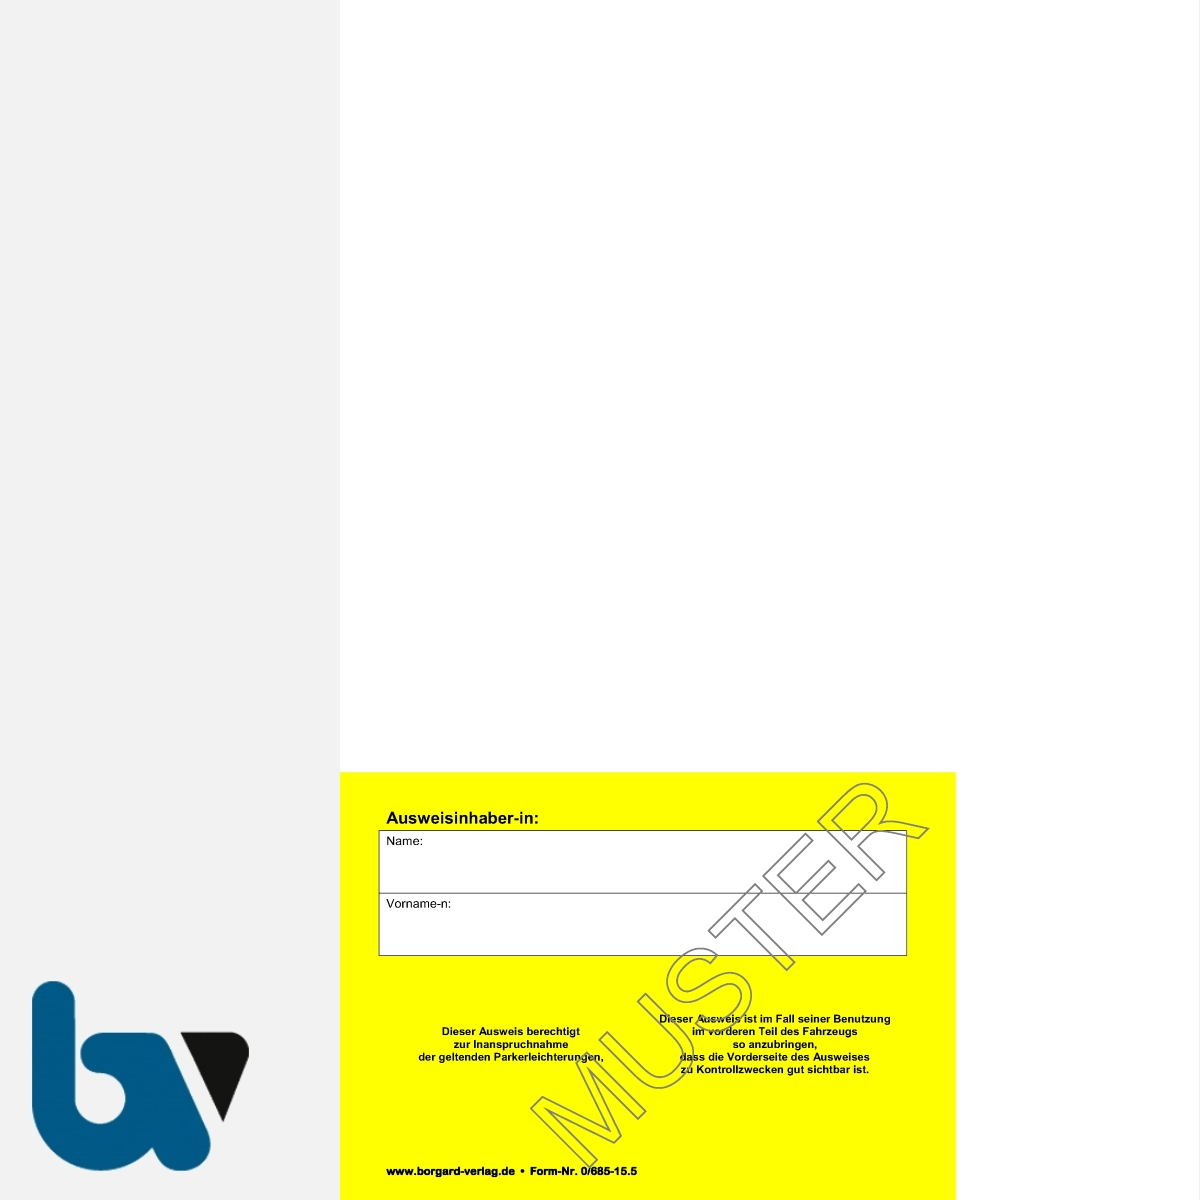 0/685-15.5 Parkausweis zur Ausnahmegenehmigung Parkerleichterungen Sonderregelung RP SH MV gelb Modell behinderte Menschen DIN A4 perforiert RS | Borgard Verlag GmbH